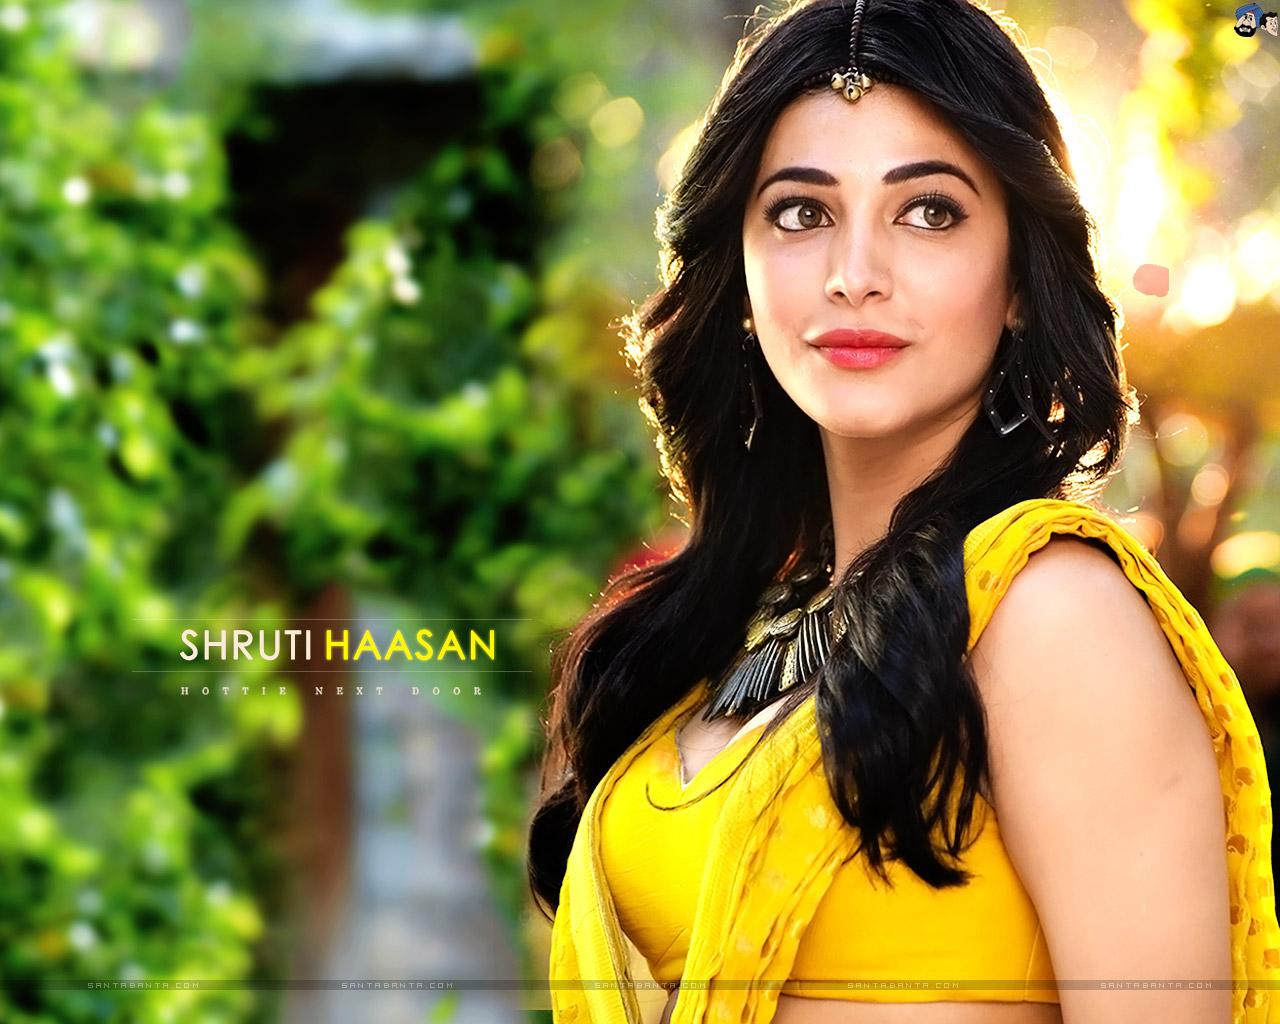 Free Download Cute Girl Wallpaper Shruti Haasan Hd Wallpapers Most Beautiful Places In The